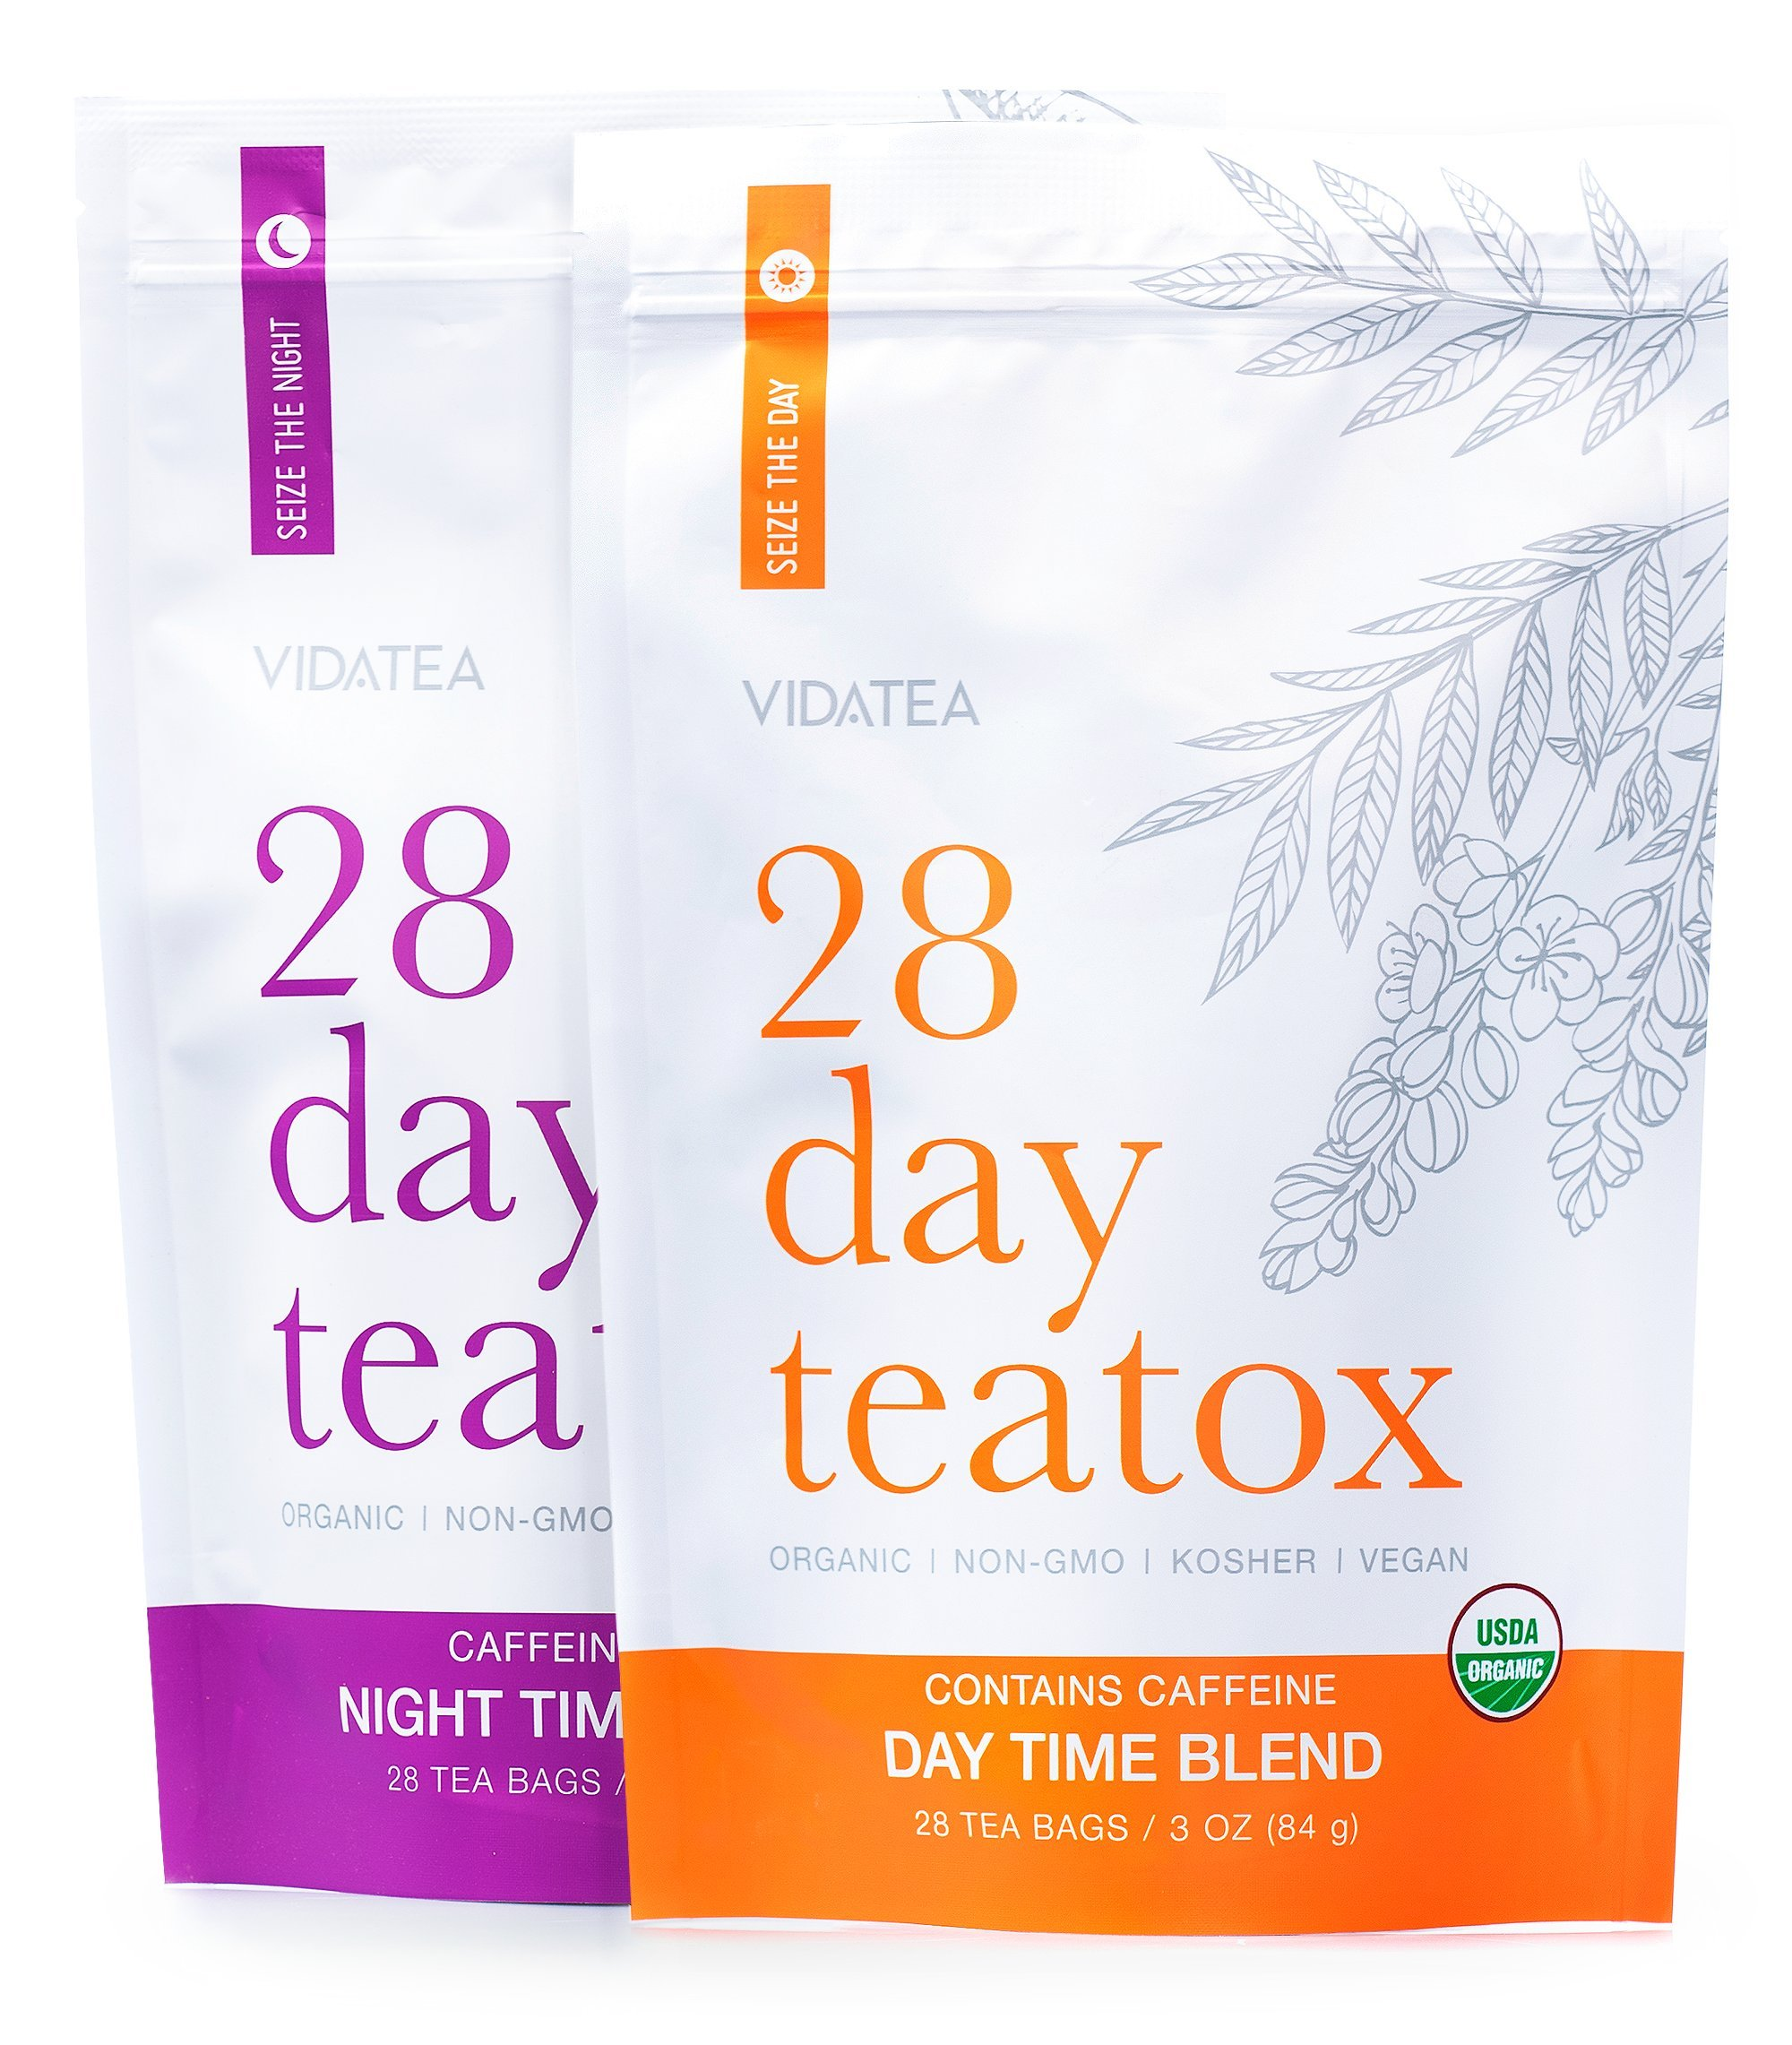 28 Day and Night Detox Tea - Teatox (56 Tea Bags) - Organic All Natural Antioxidant Weight Loss Tea, Herbal Body Detox Cleanse, with Refreshing Taste - Vida Tea